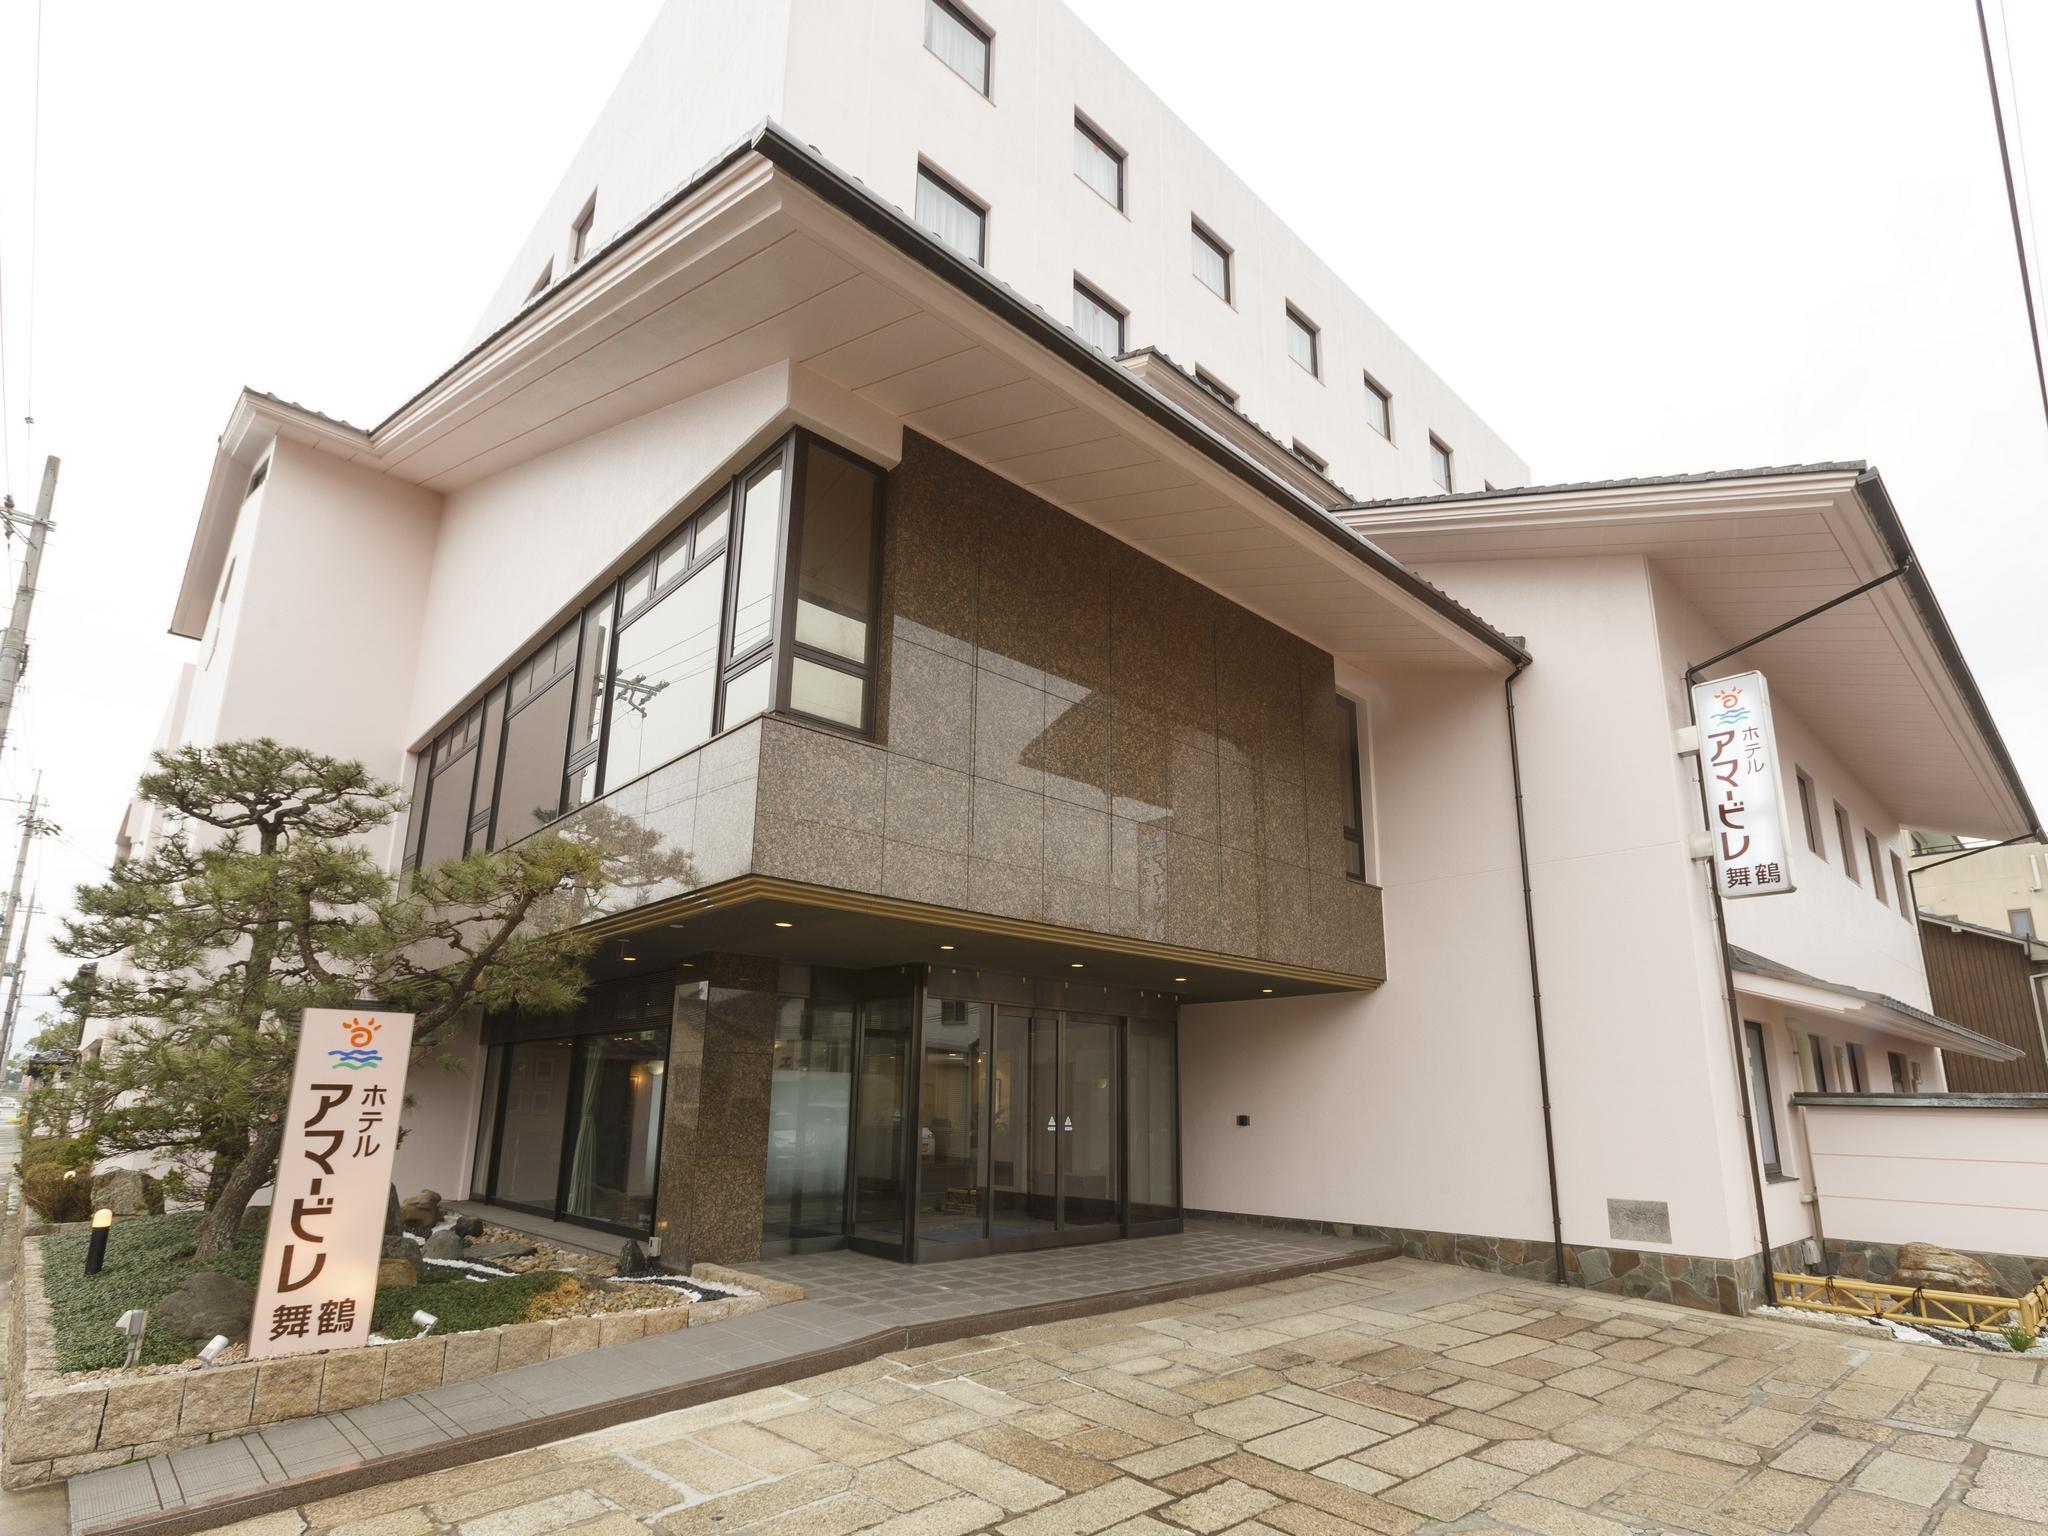 Hotel Amabile Maizuru